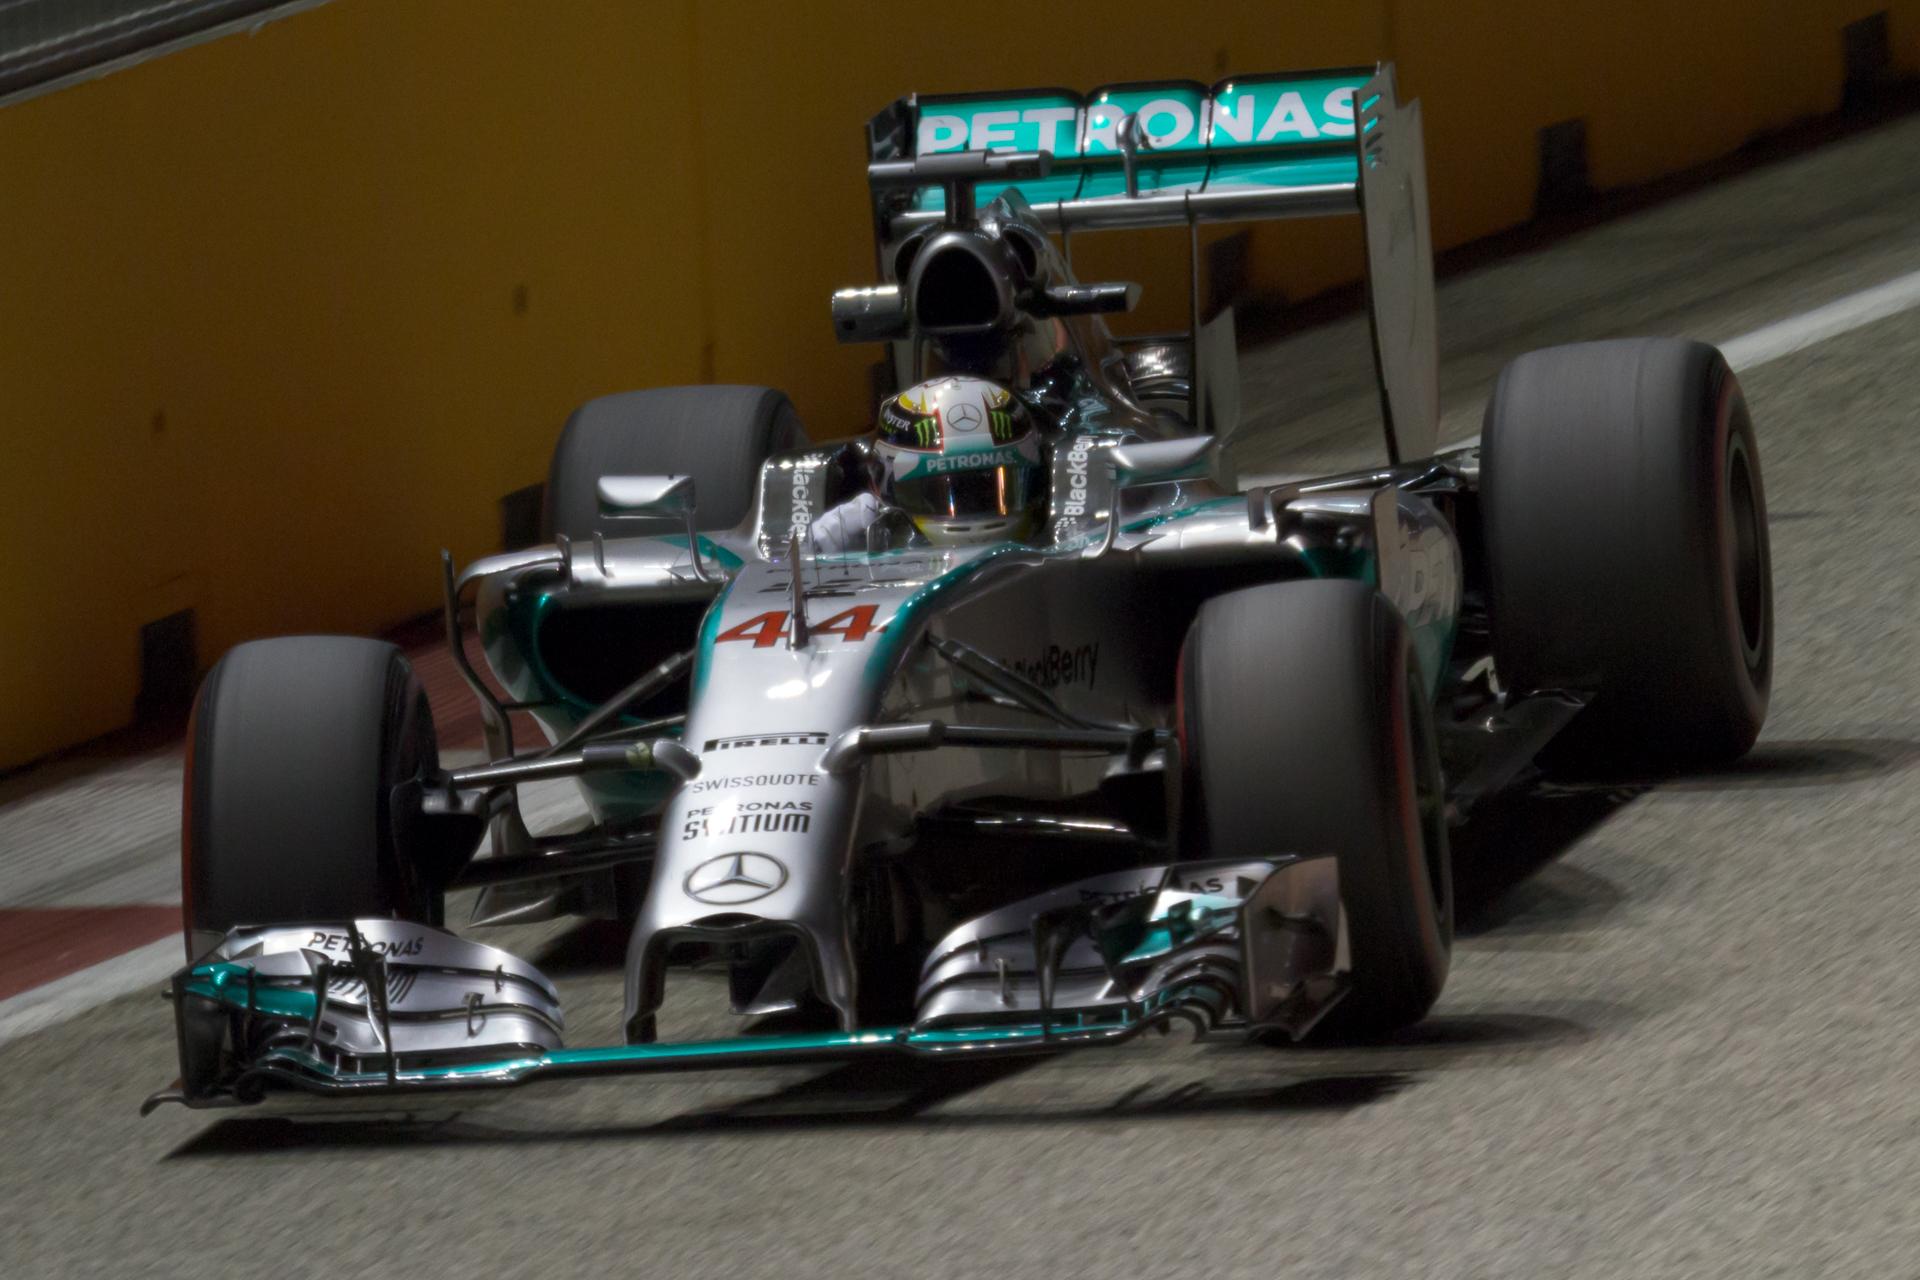 Formel 1 Weltmeisterschaft 2014 Wikipedia